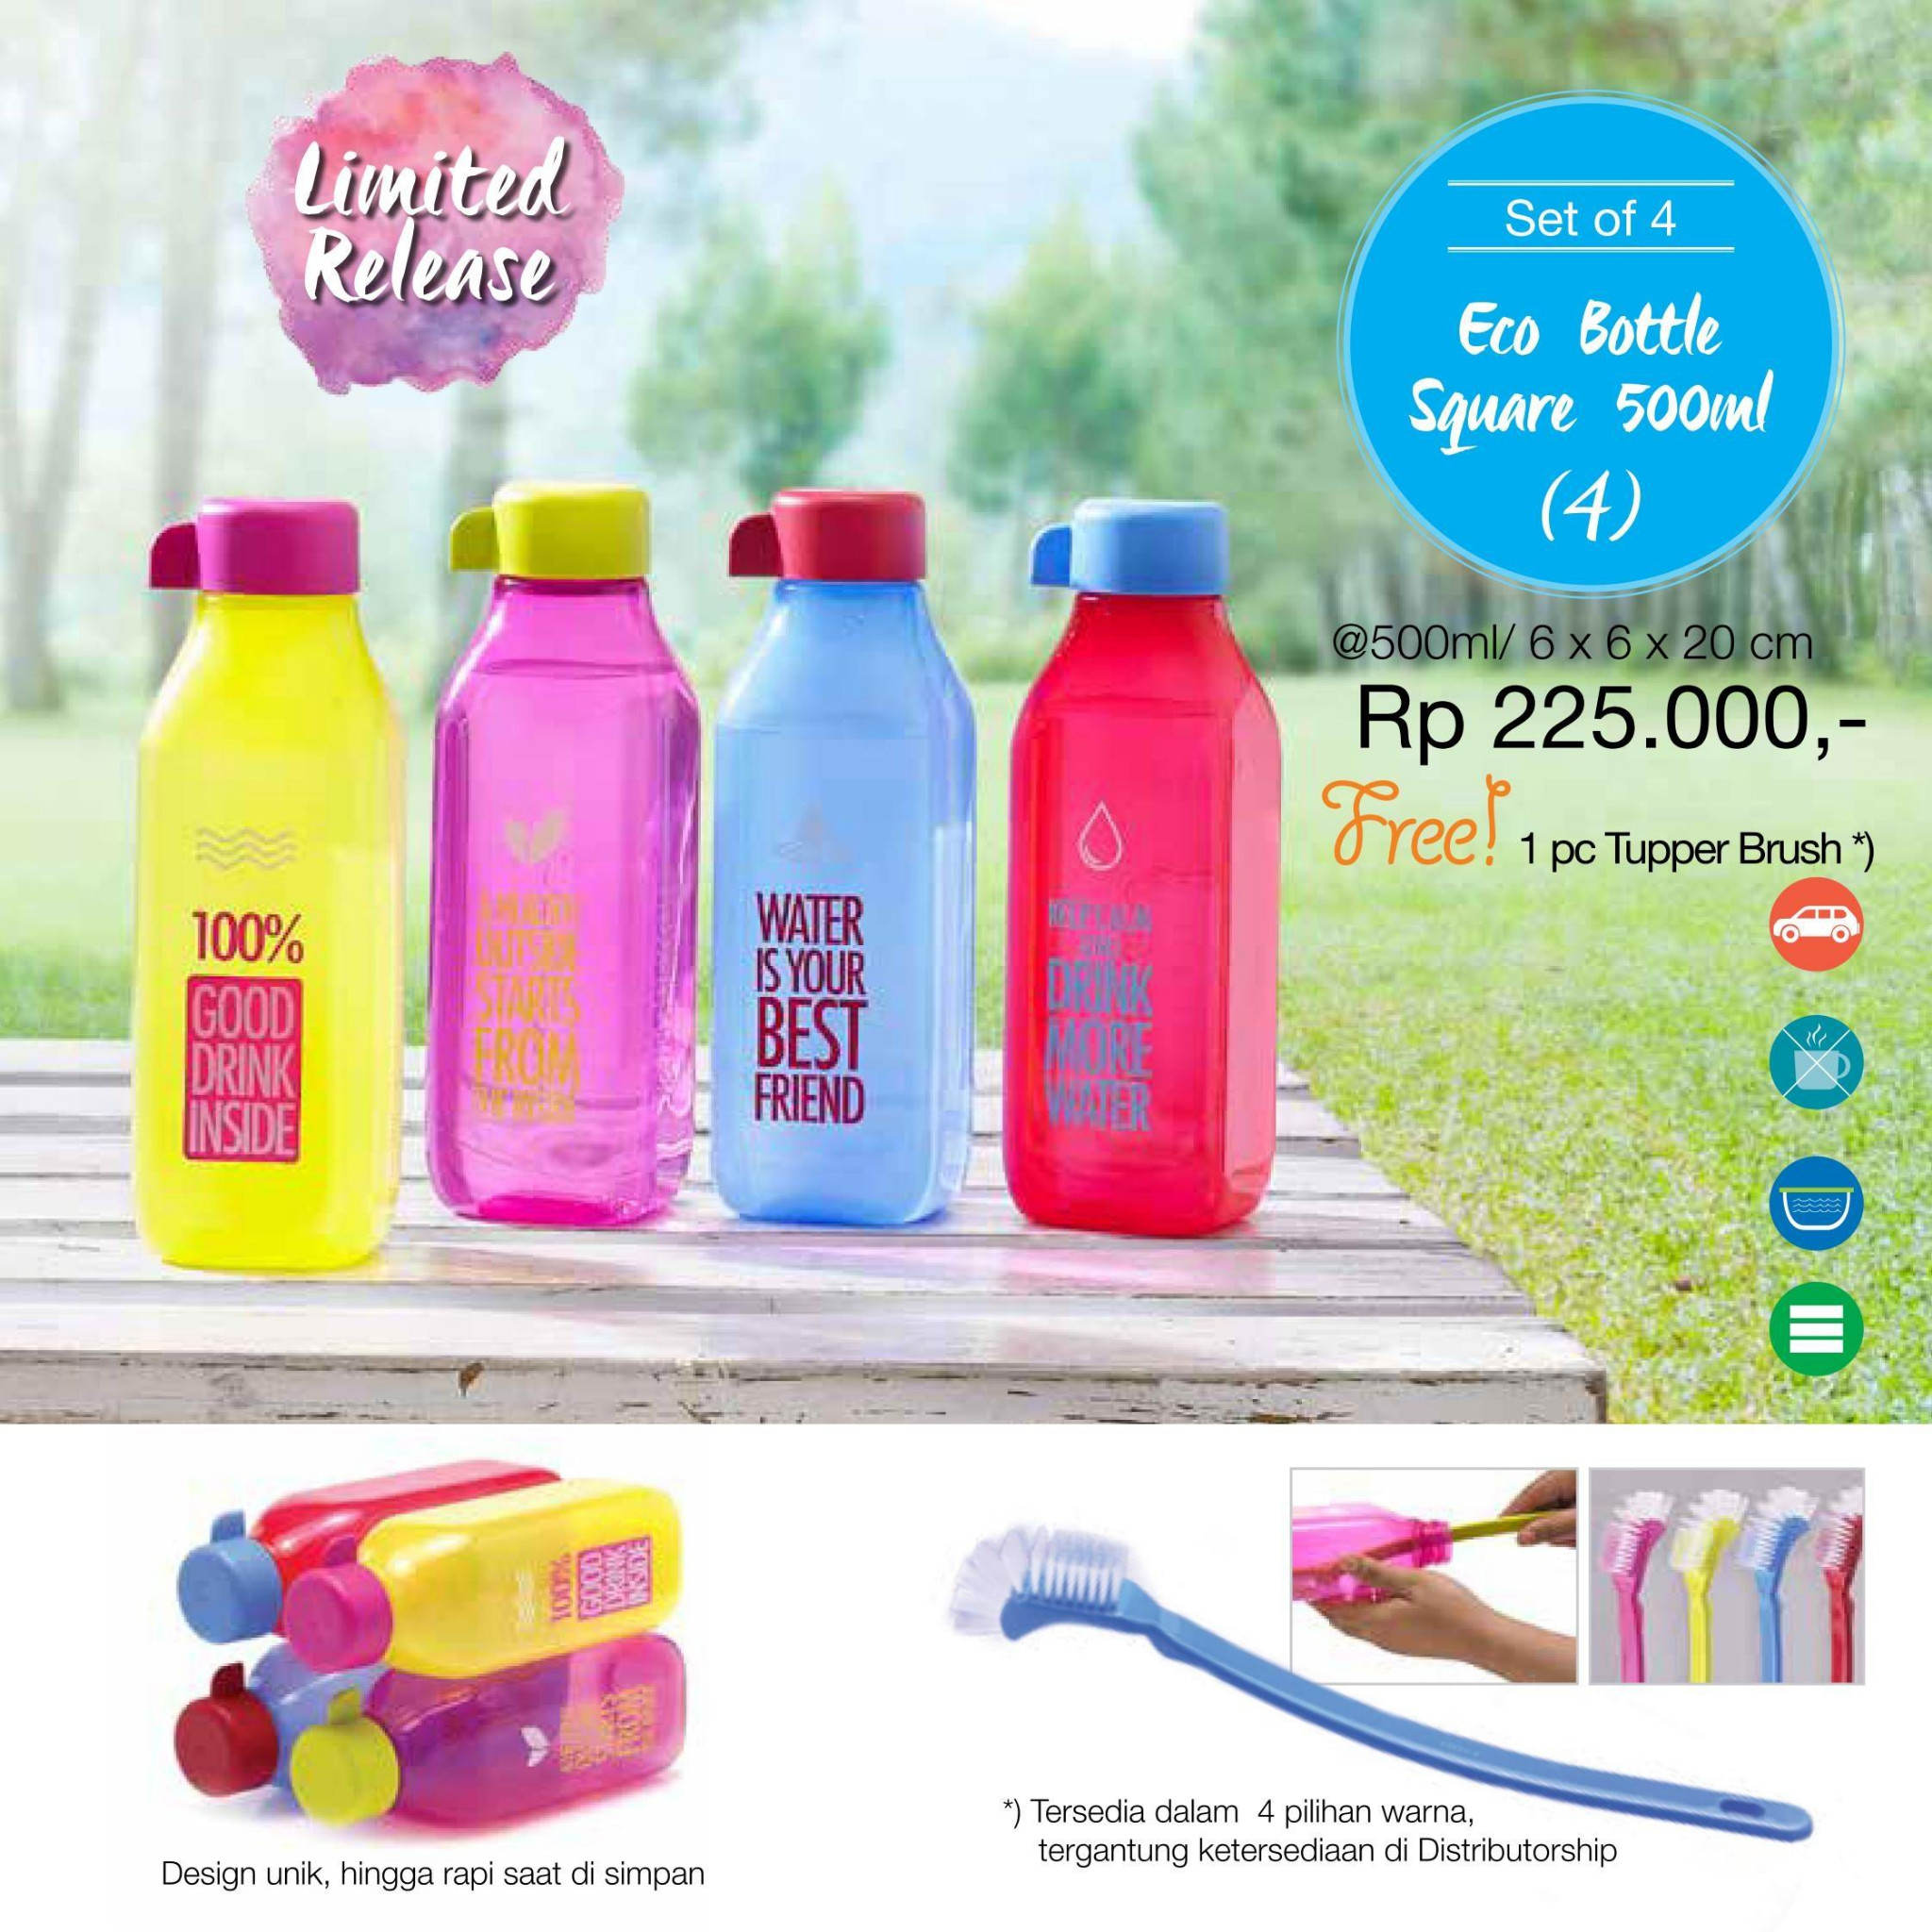 Tupperware Botol Hitam 750ml Daftar Harga Terlengkap Indonesia Eco Man Minum 750 Ml Home Page 2 Bottle Square 500ml